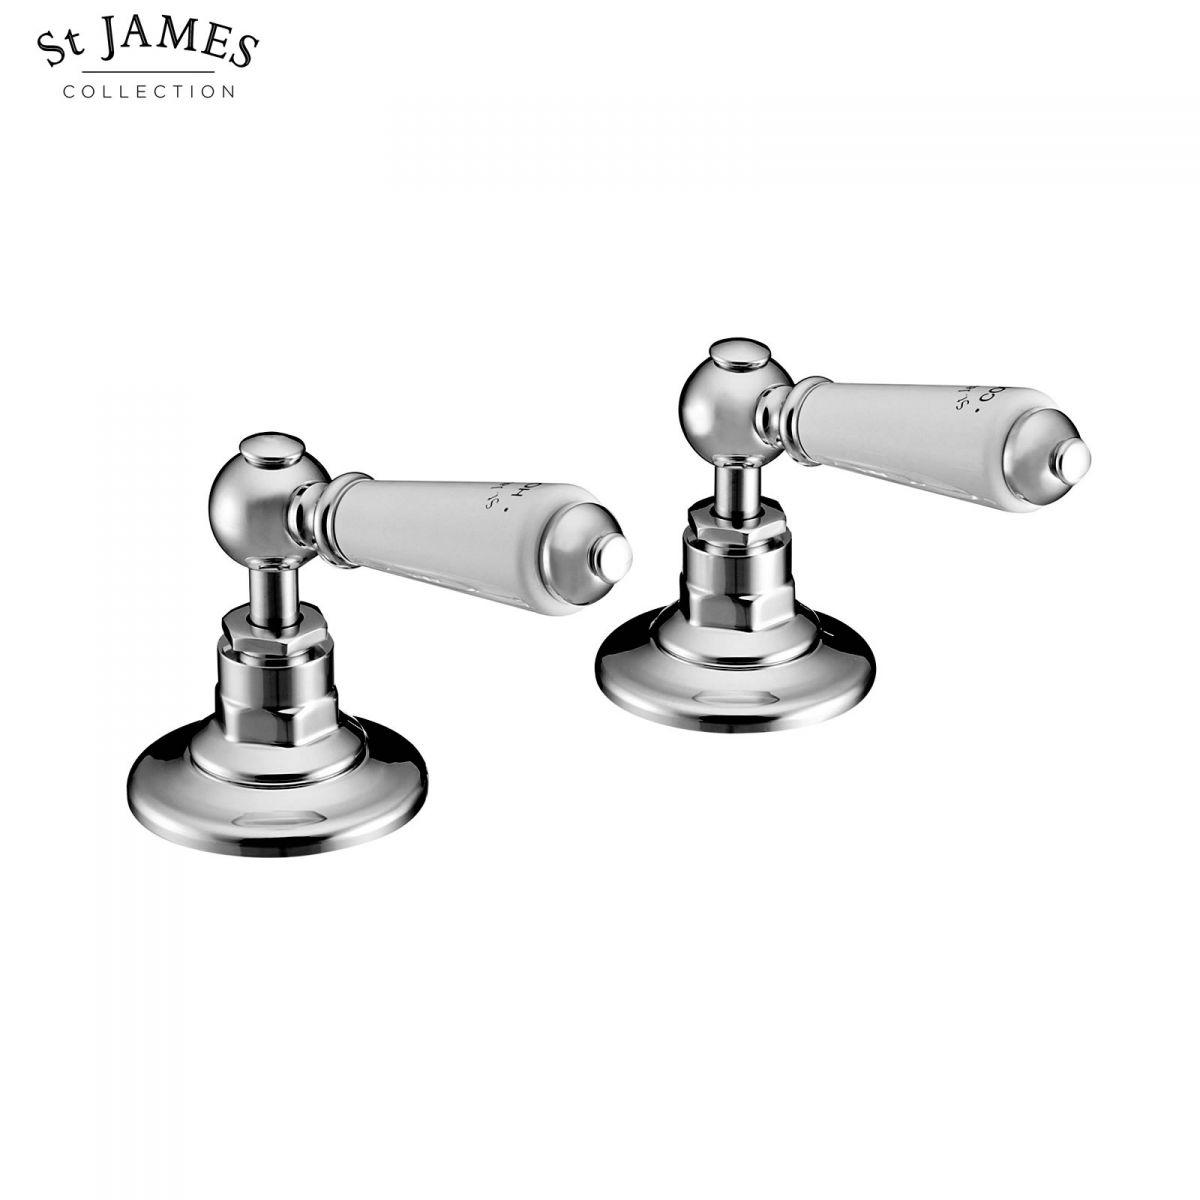 St James Deck Mounted Bath Flow Valves Uk Bathrooms